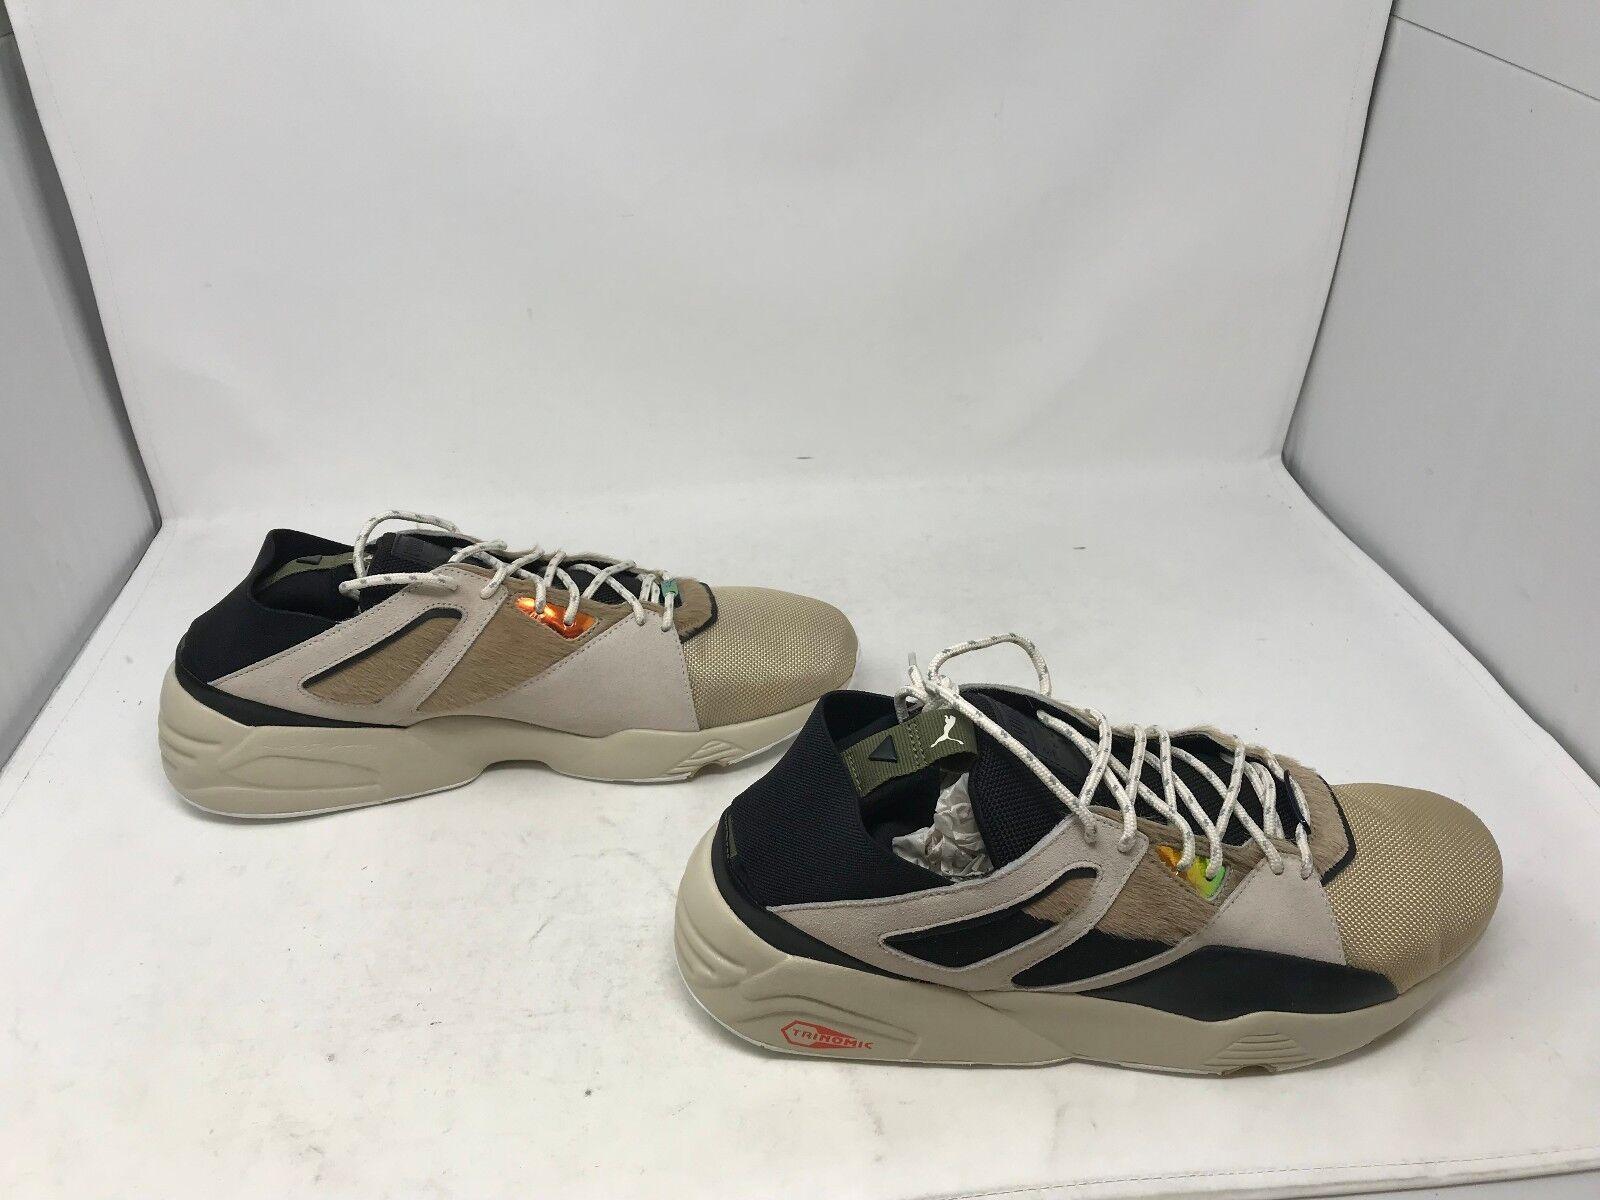 Uomo Puma (361904 02) Blaze Of Glory Camping Sock Bog Birch Shoes       (H31-32)